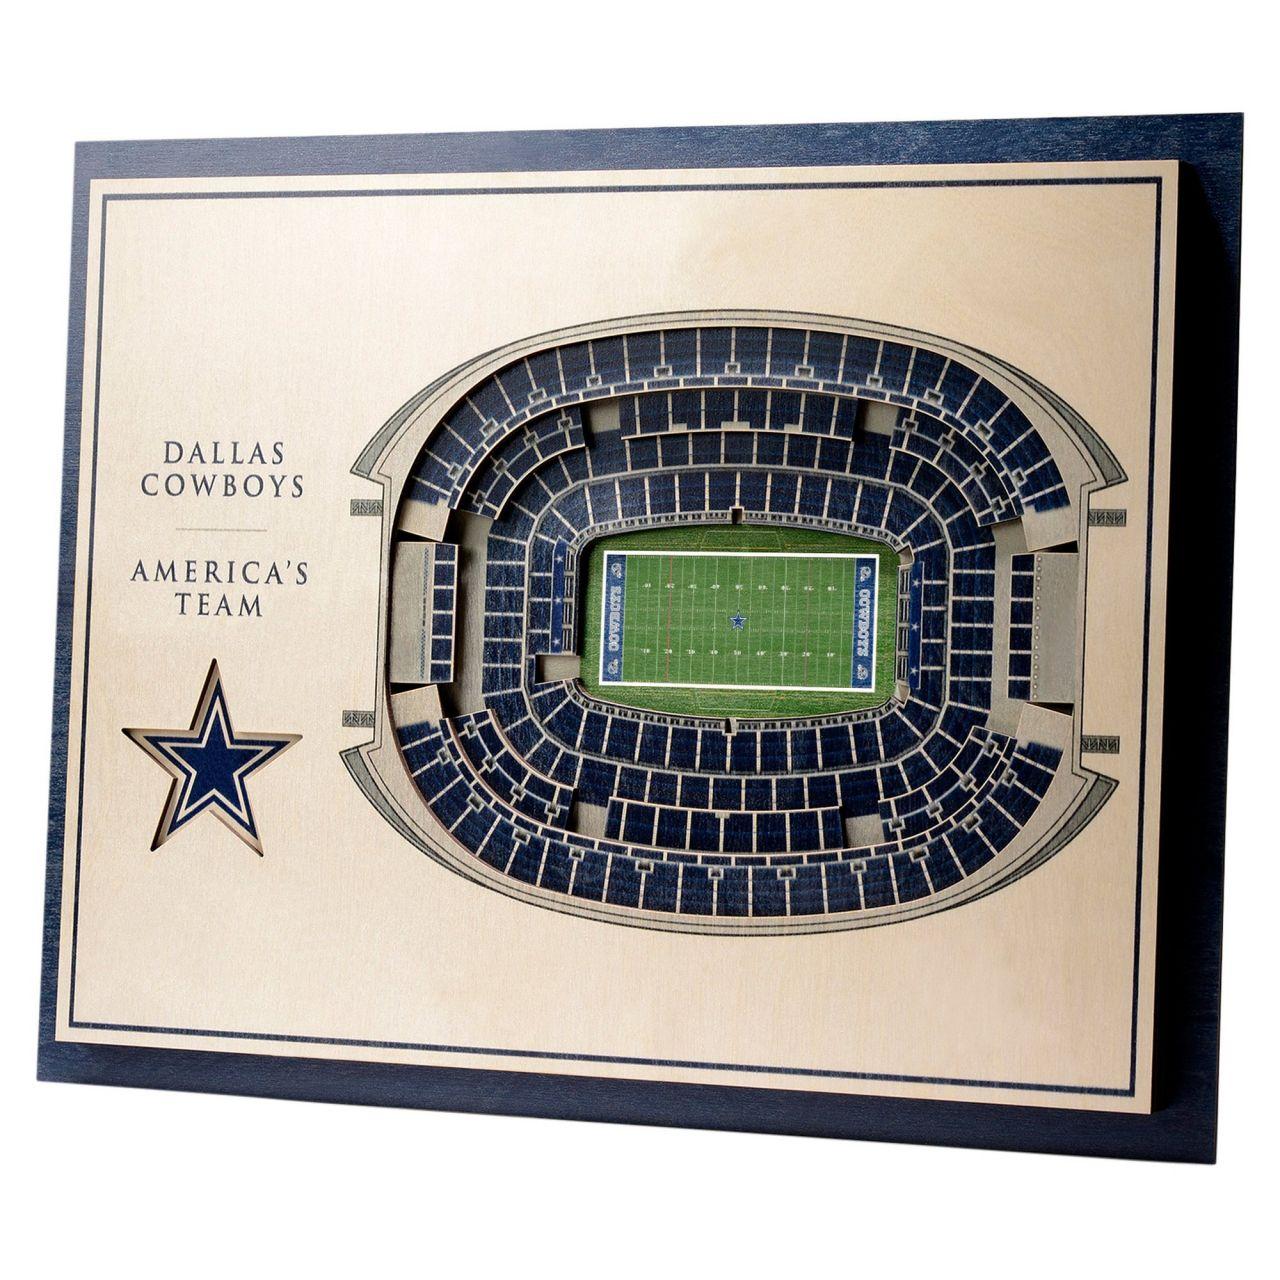 amfoo - YouTheFan Holz Wanddeko Stadion Dallas Cowboys 43x33cm